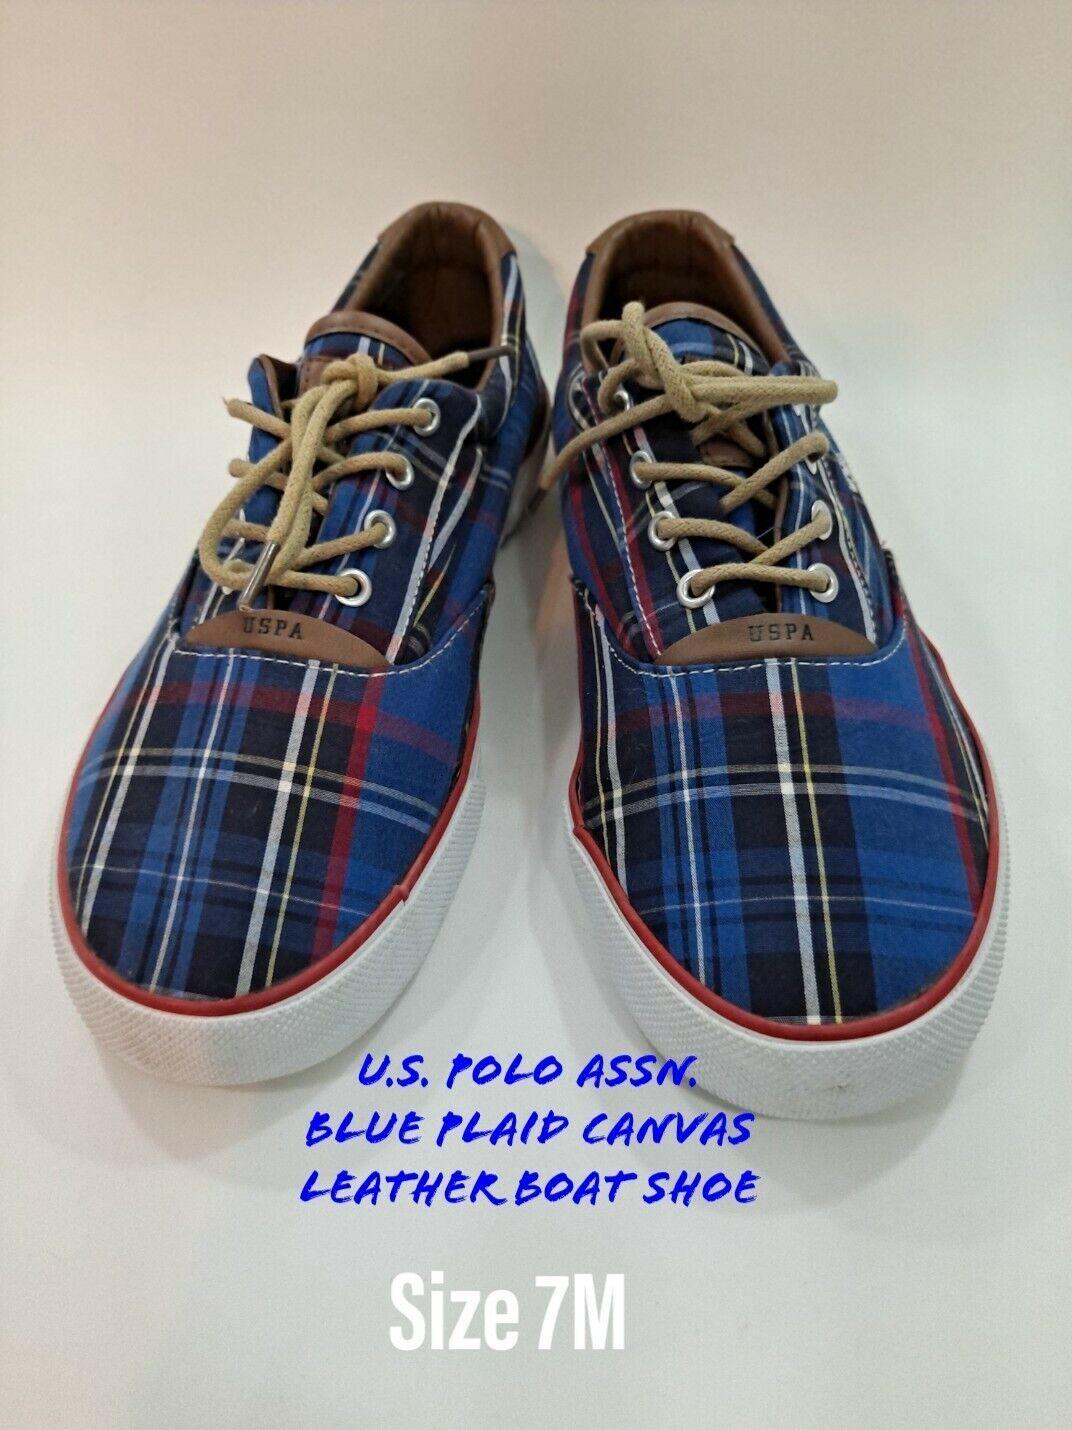 Men's U.S. Polo Assn. USPA Sneakers Boat Shoes Sz 7.5 Blue Plaid Canvas leather